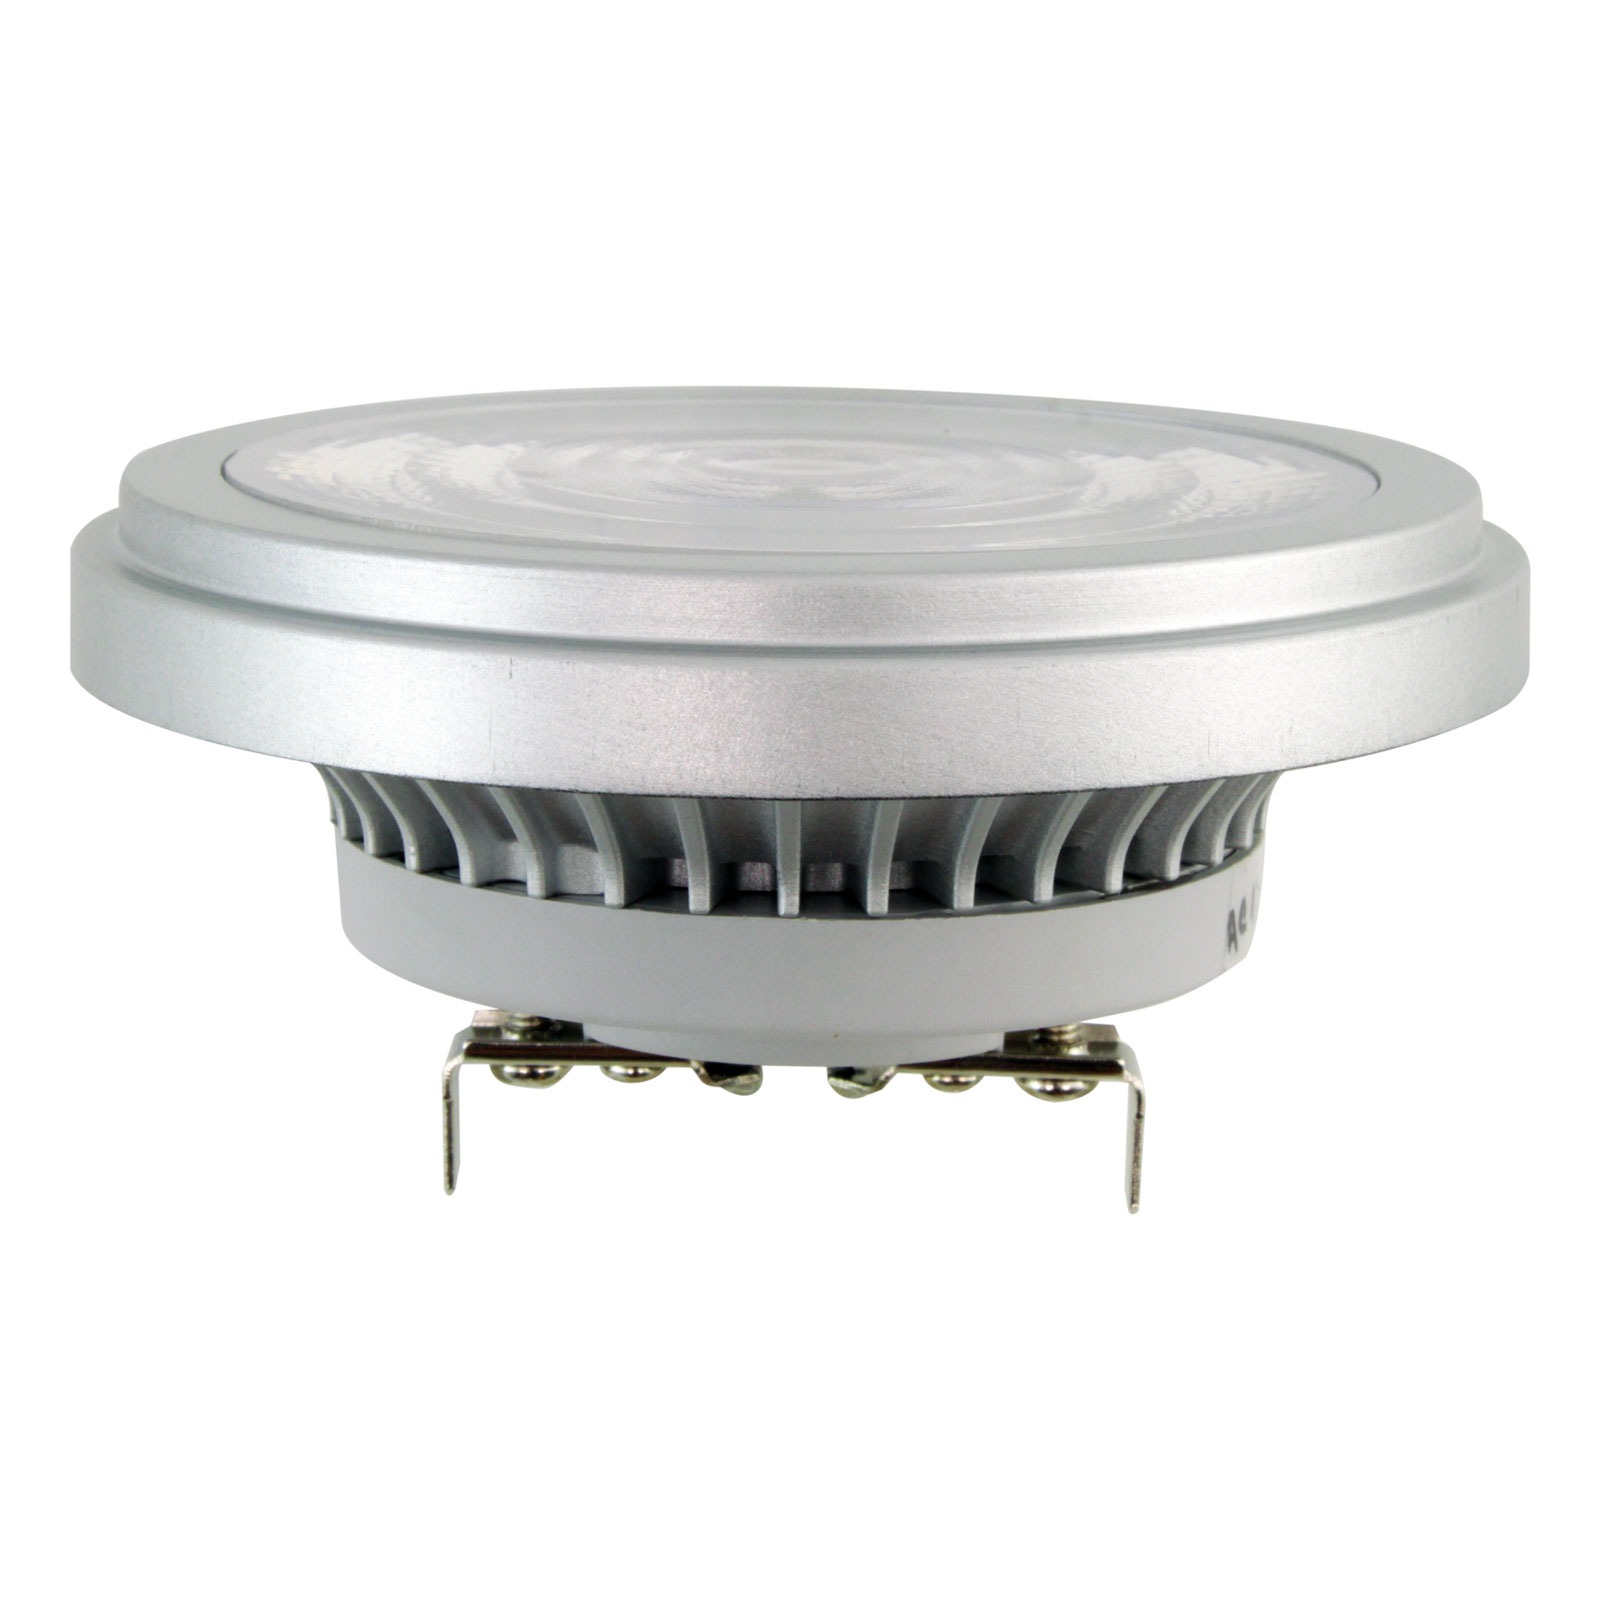 Dual Beam LED-pære G53 13W, varmhvid